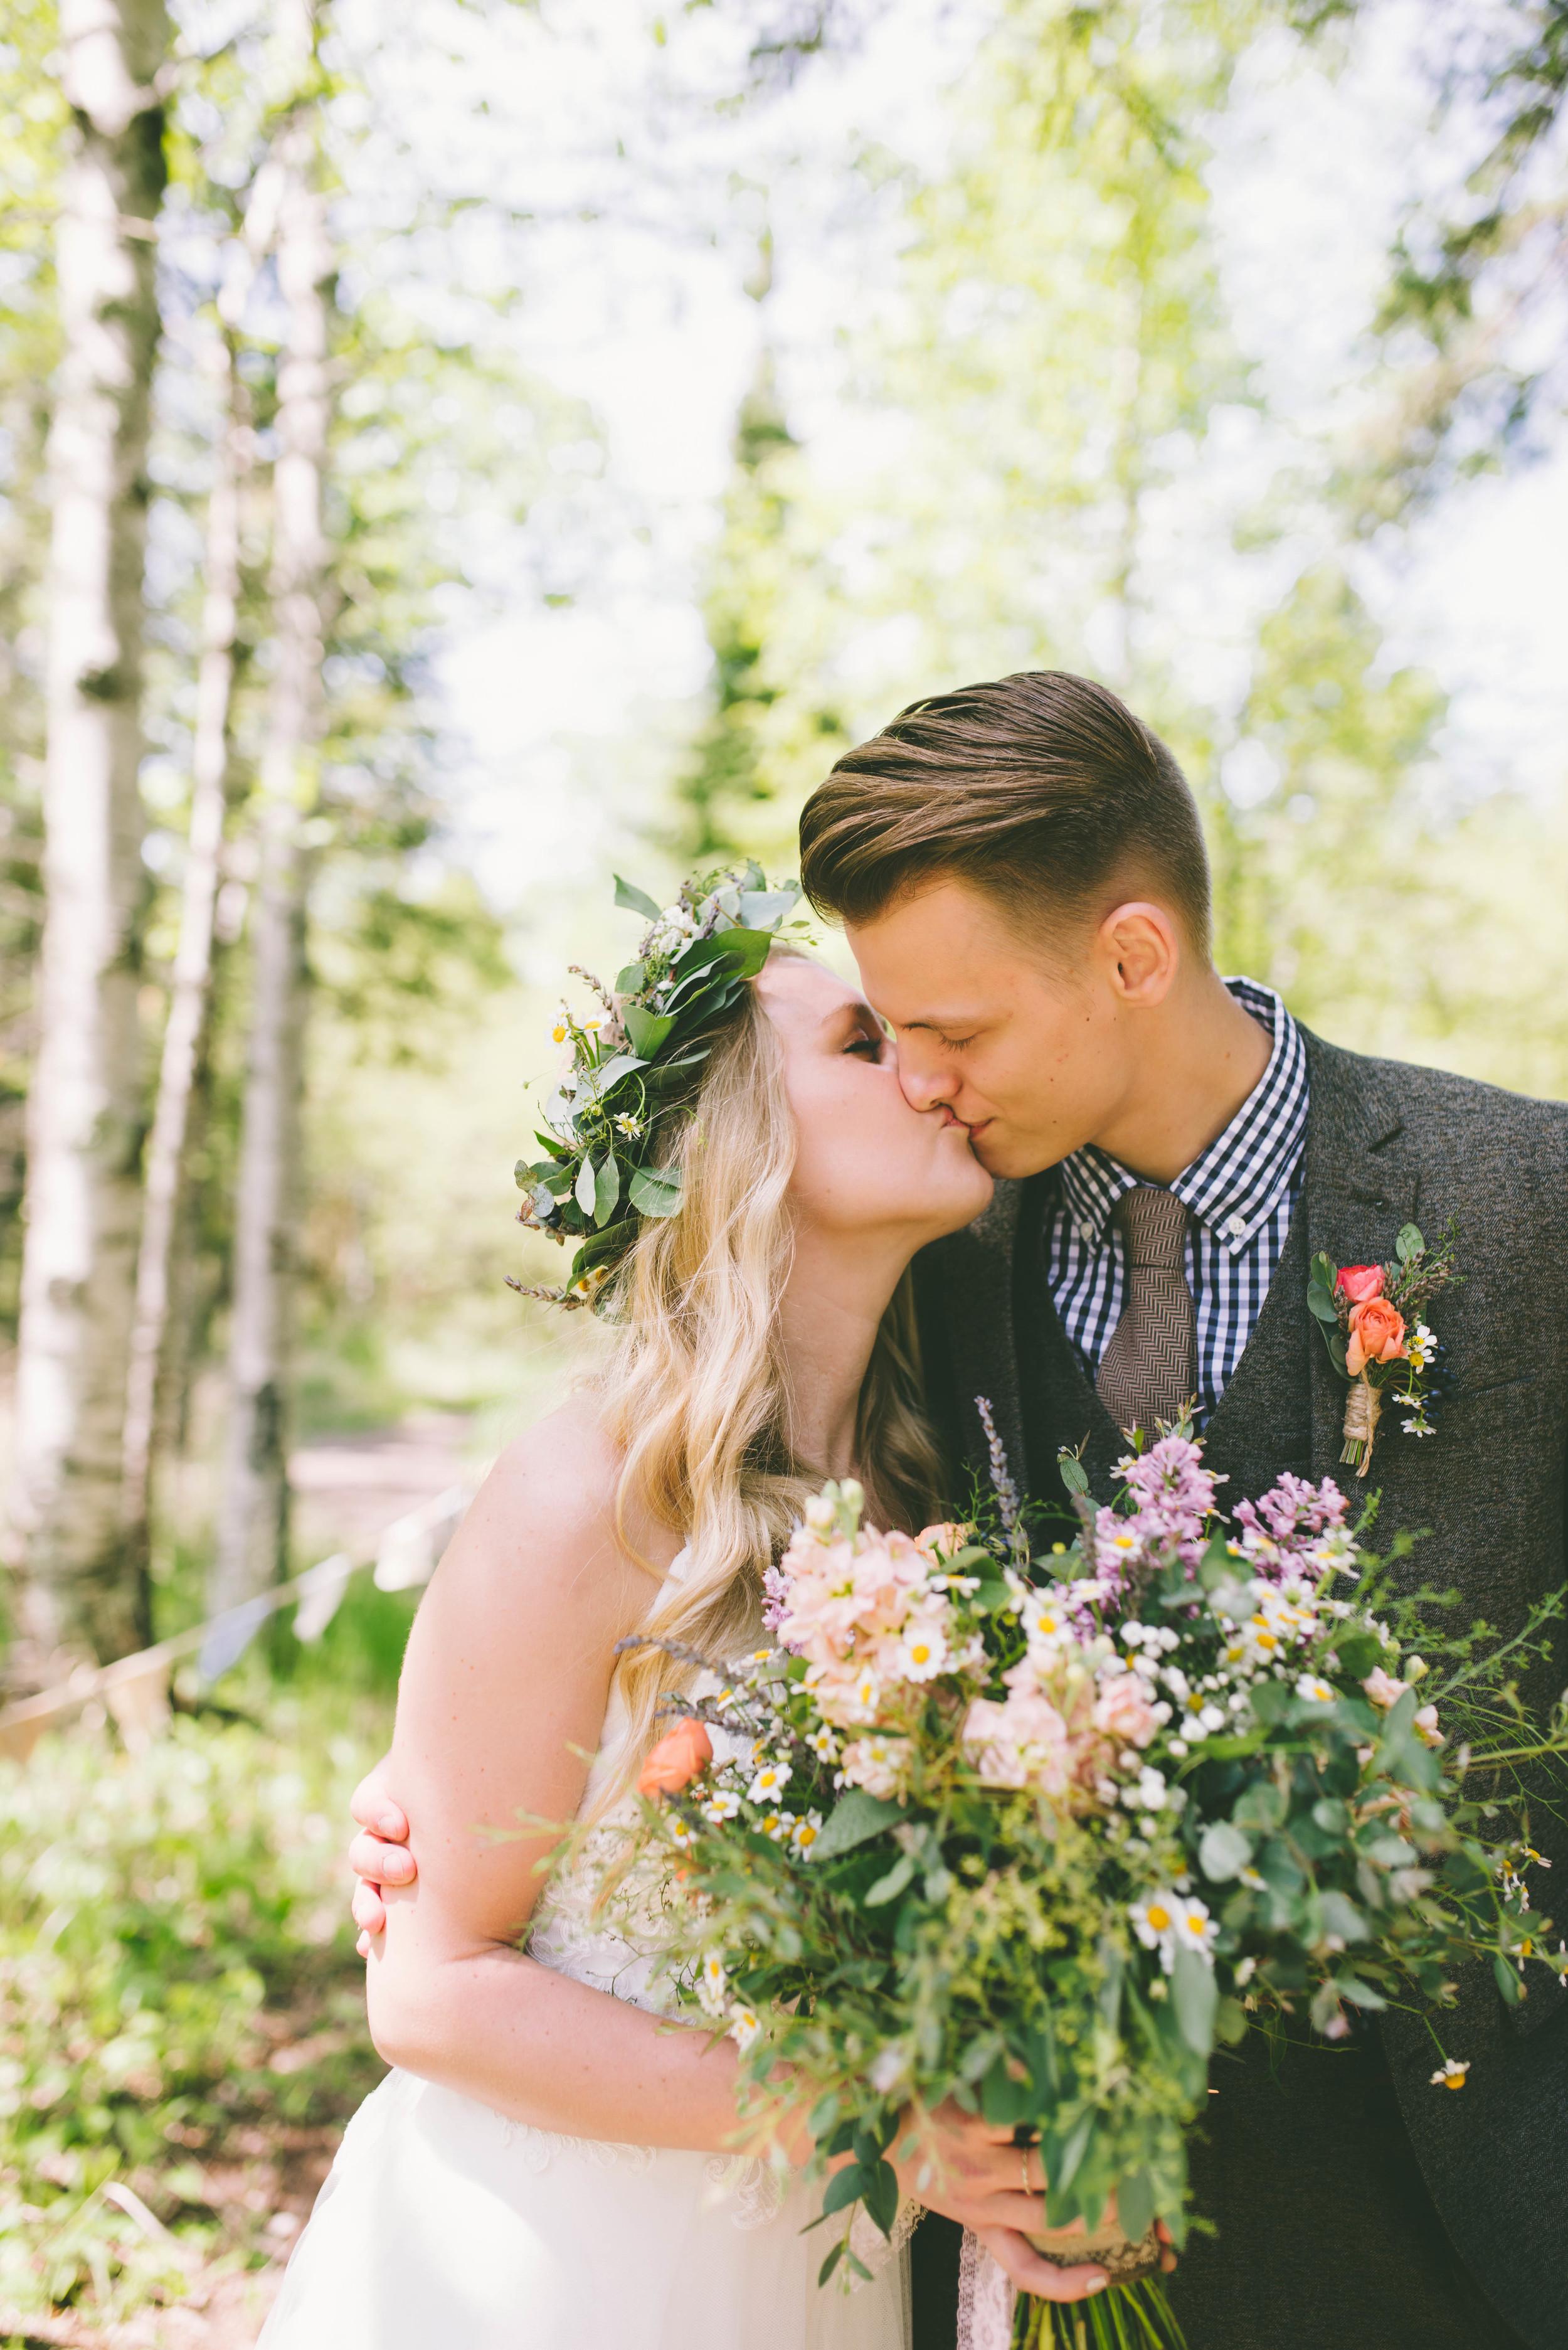 the-bees-knees-floral-design-studio-brainerd-mn-minnesota-wedding-florist-bride-sharayah-wildflower-wedding-bouquet